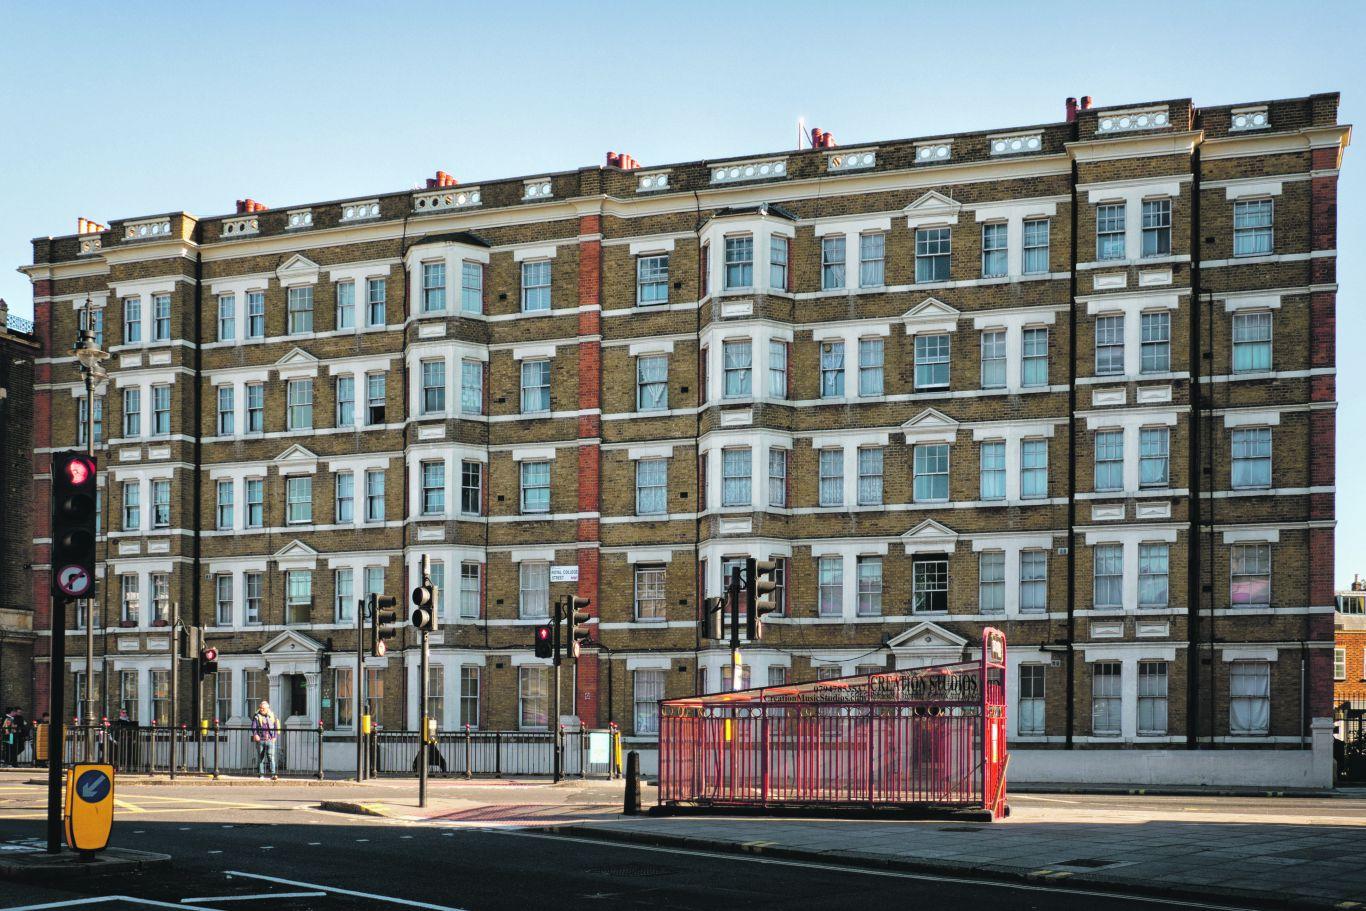 Royal College Street. Photo: LB